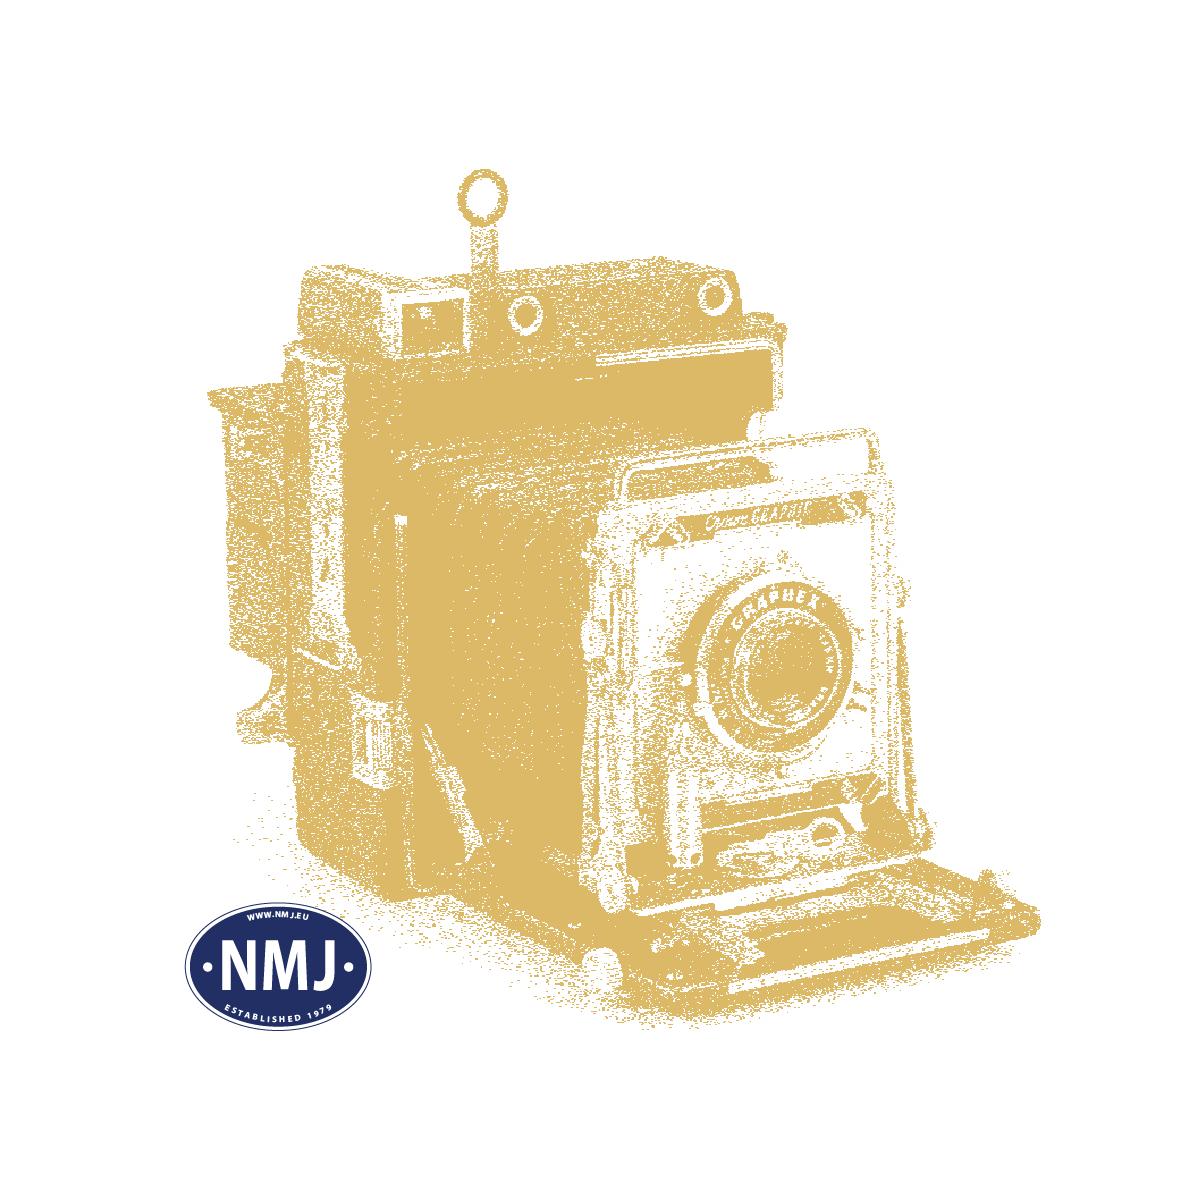 NMJT502.302 - NMJ Topline Kpbs 21 76 335 3 755-0 Rungenwagen NSB mit Beladung